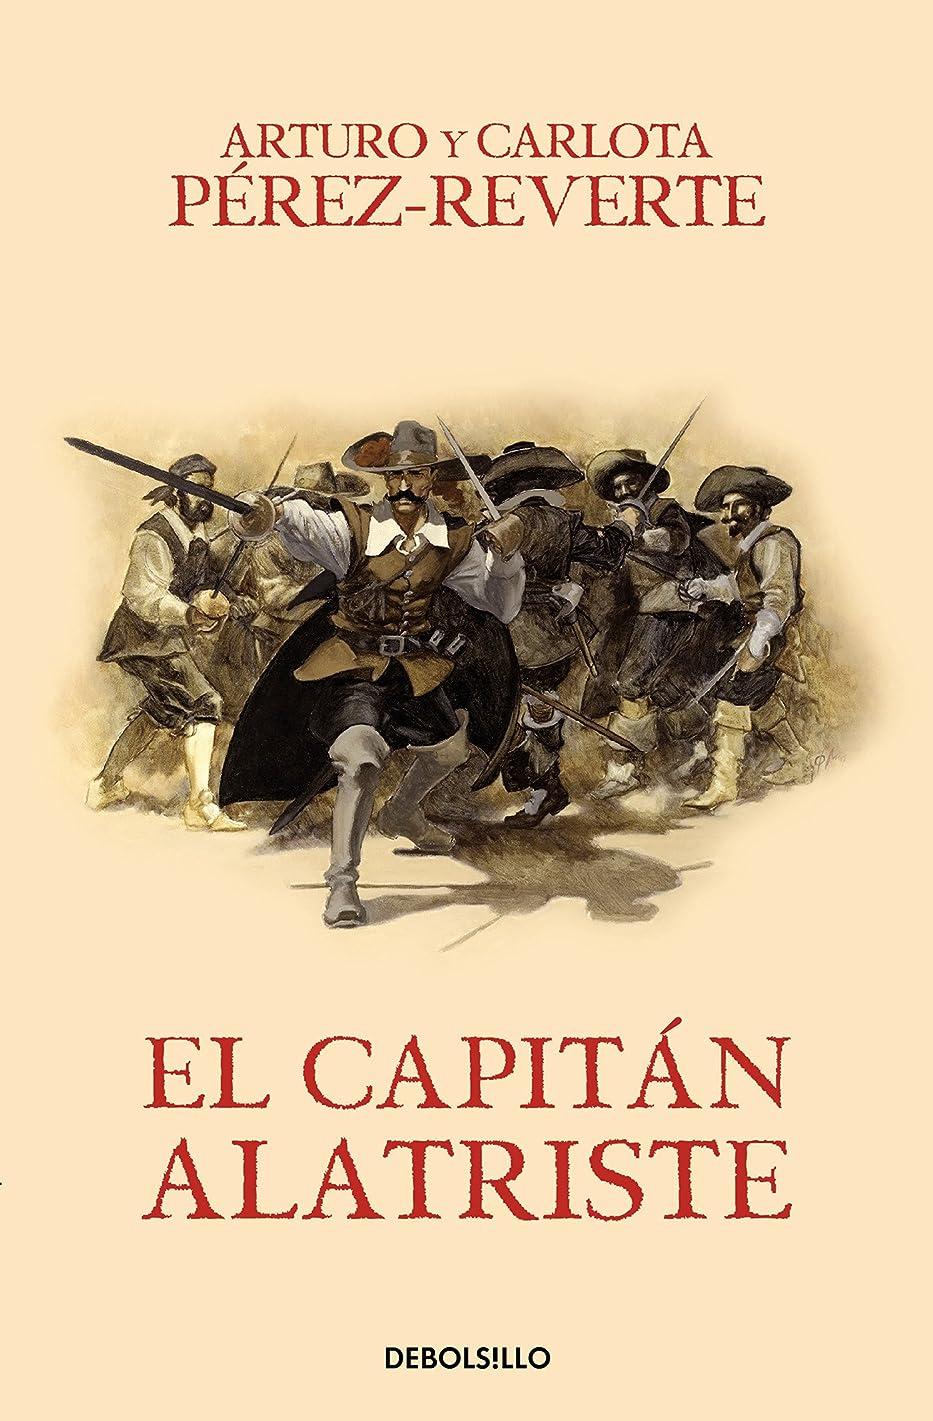 El capitán Alatriste / Captain Alatriste (Capitán Alatriste #1) (Spanish Edition)